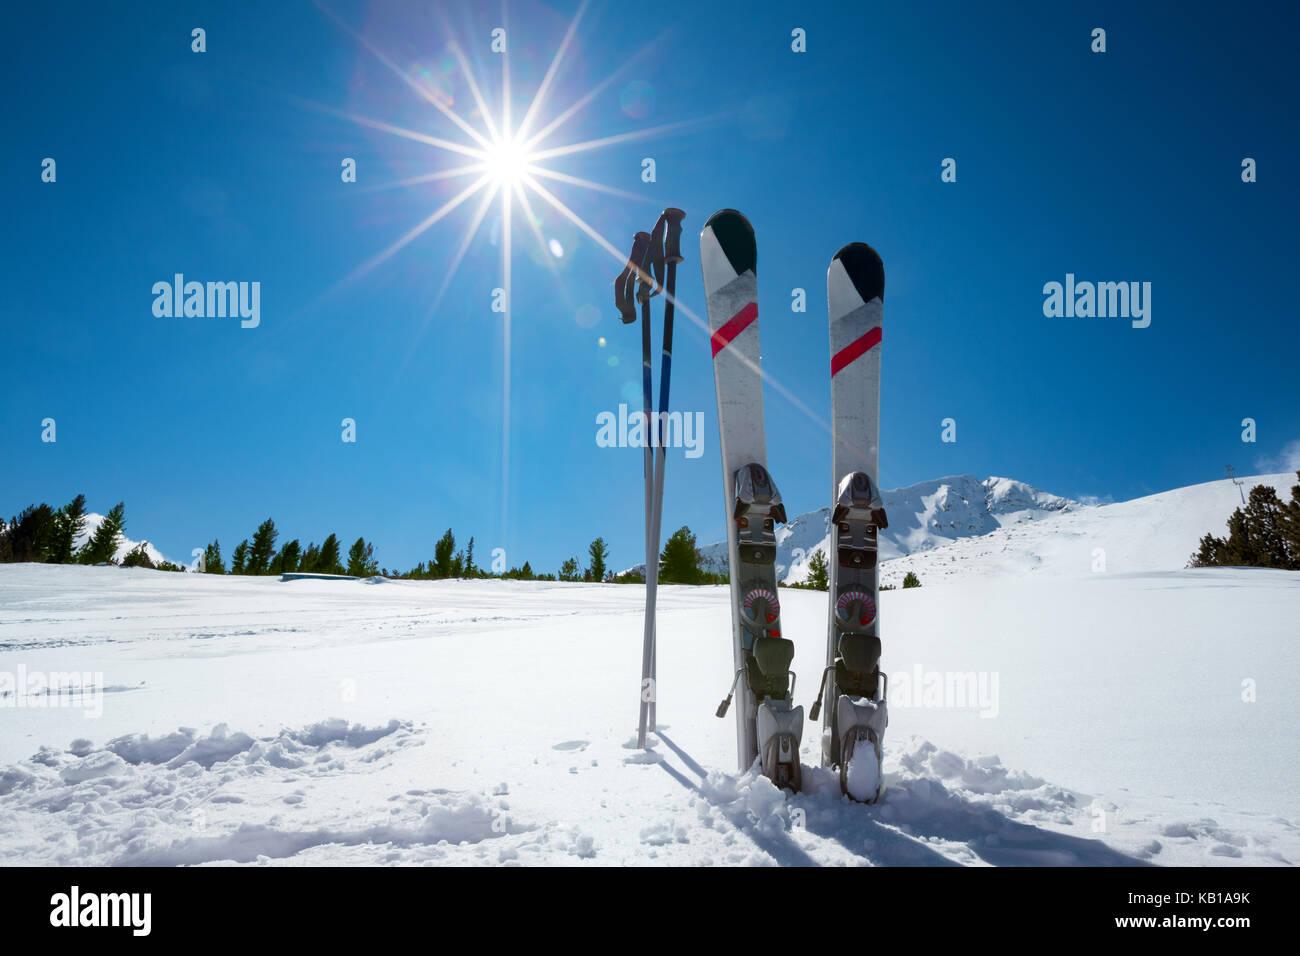 Skiing, winter season , mountains and ski equipment on ski run - Stock Image